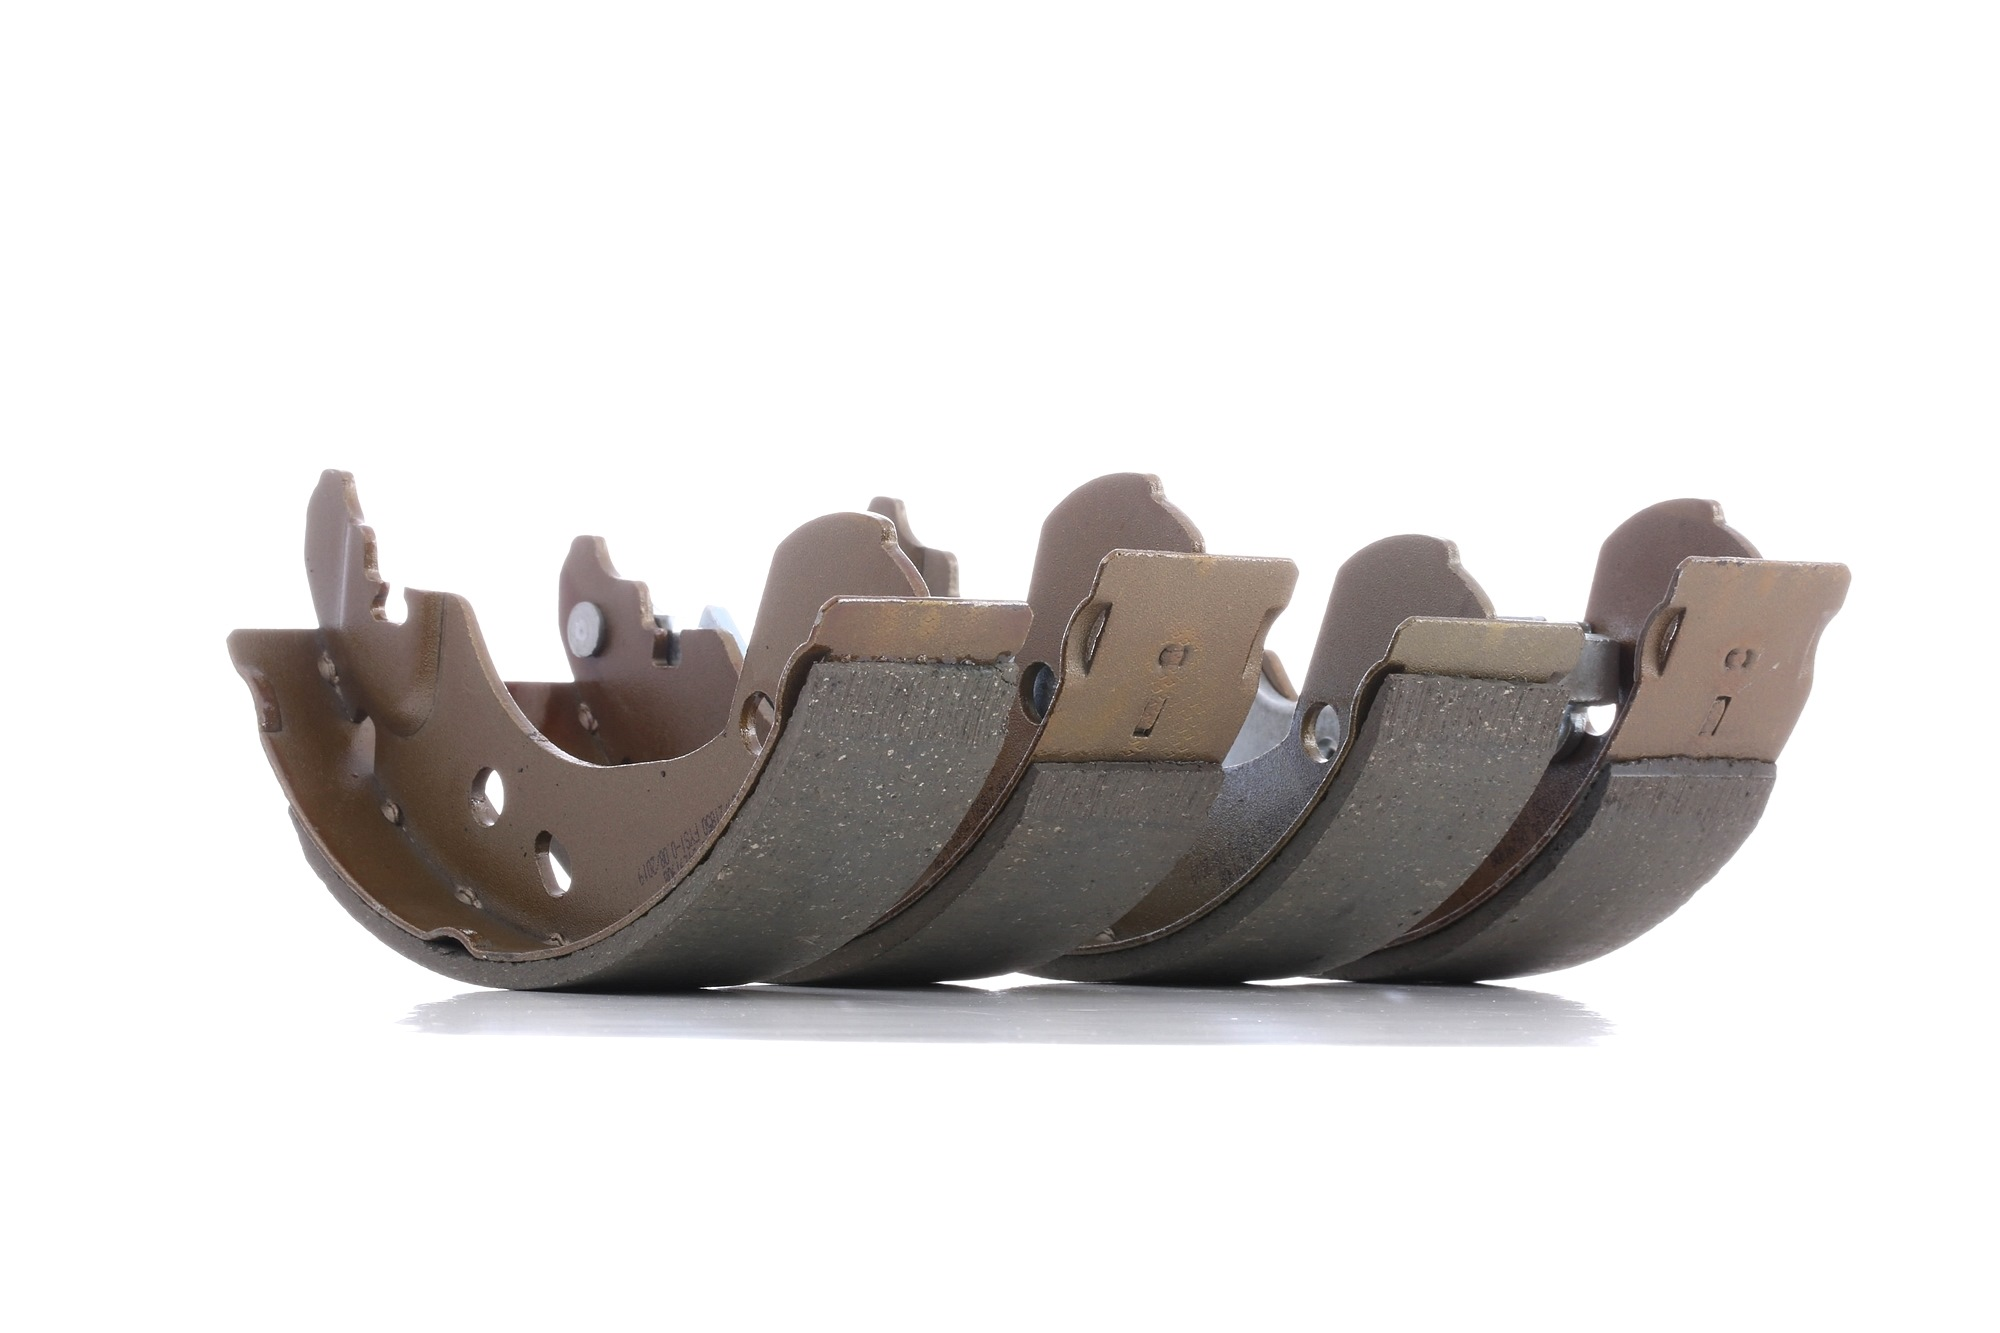 DENCKERMANN Brake Shoes NISSAN,RENAULT B120136 440600X825,44060AX625,D4060AX600 Brake Shoe Set,Brake Lining 7701208357